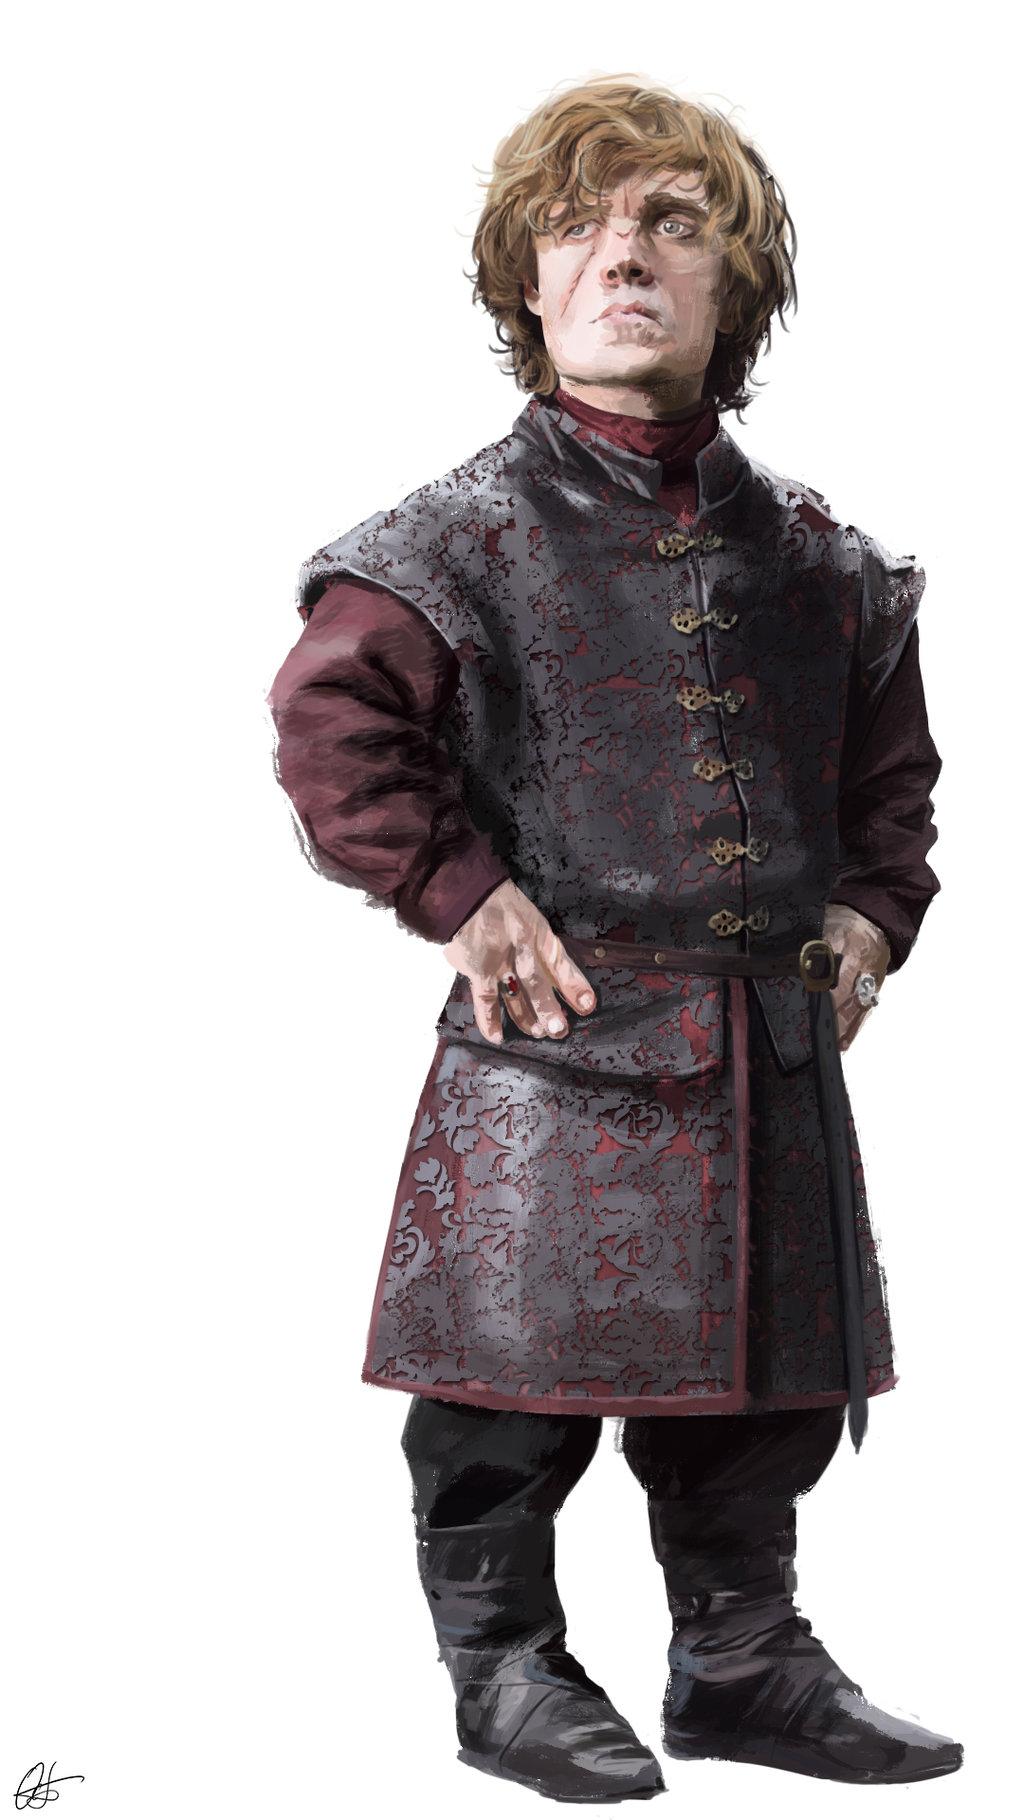 GoT Fanart - Tyrion Lannister